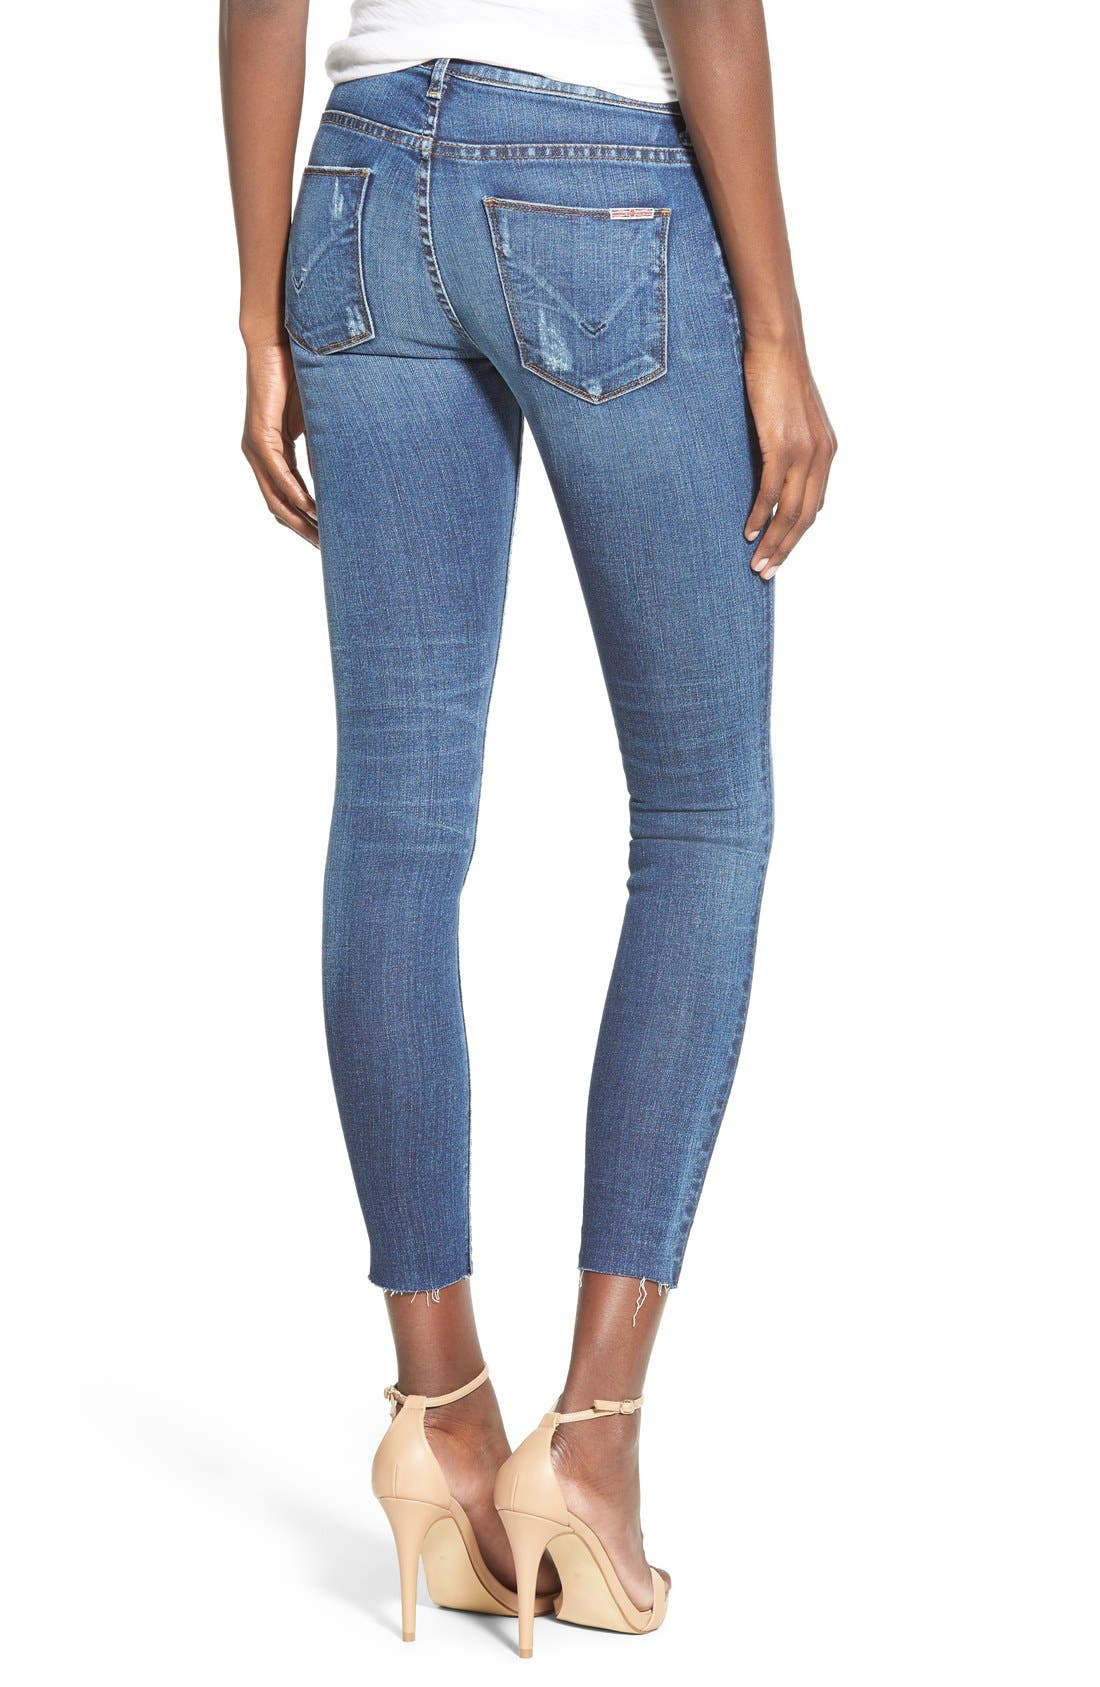 Alternate Image 2  - Hudson Jeans 'Krista' Raw Hem Ankle Super Skinny Jeans (Point Break)